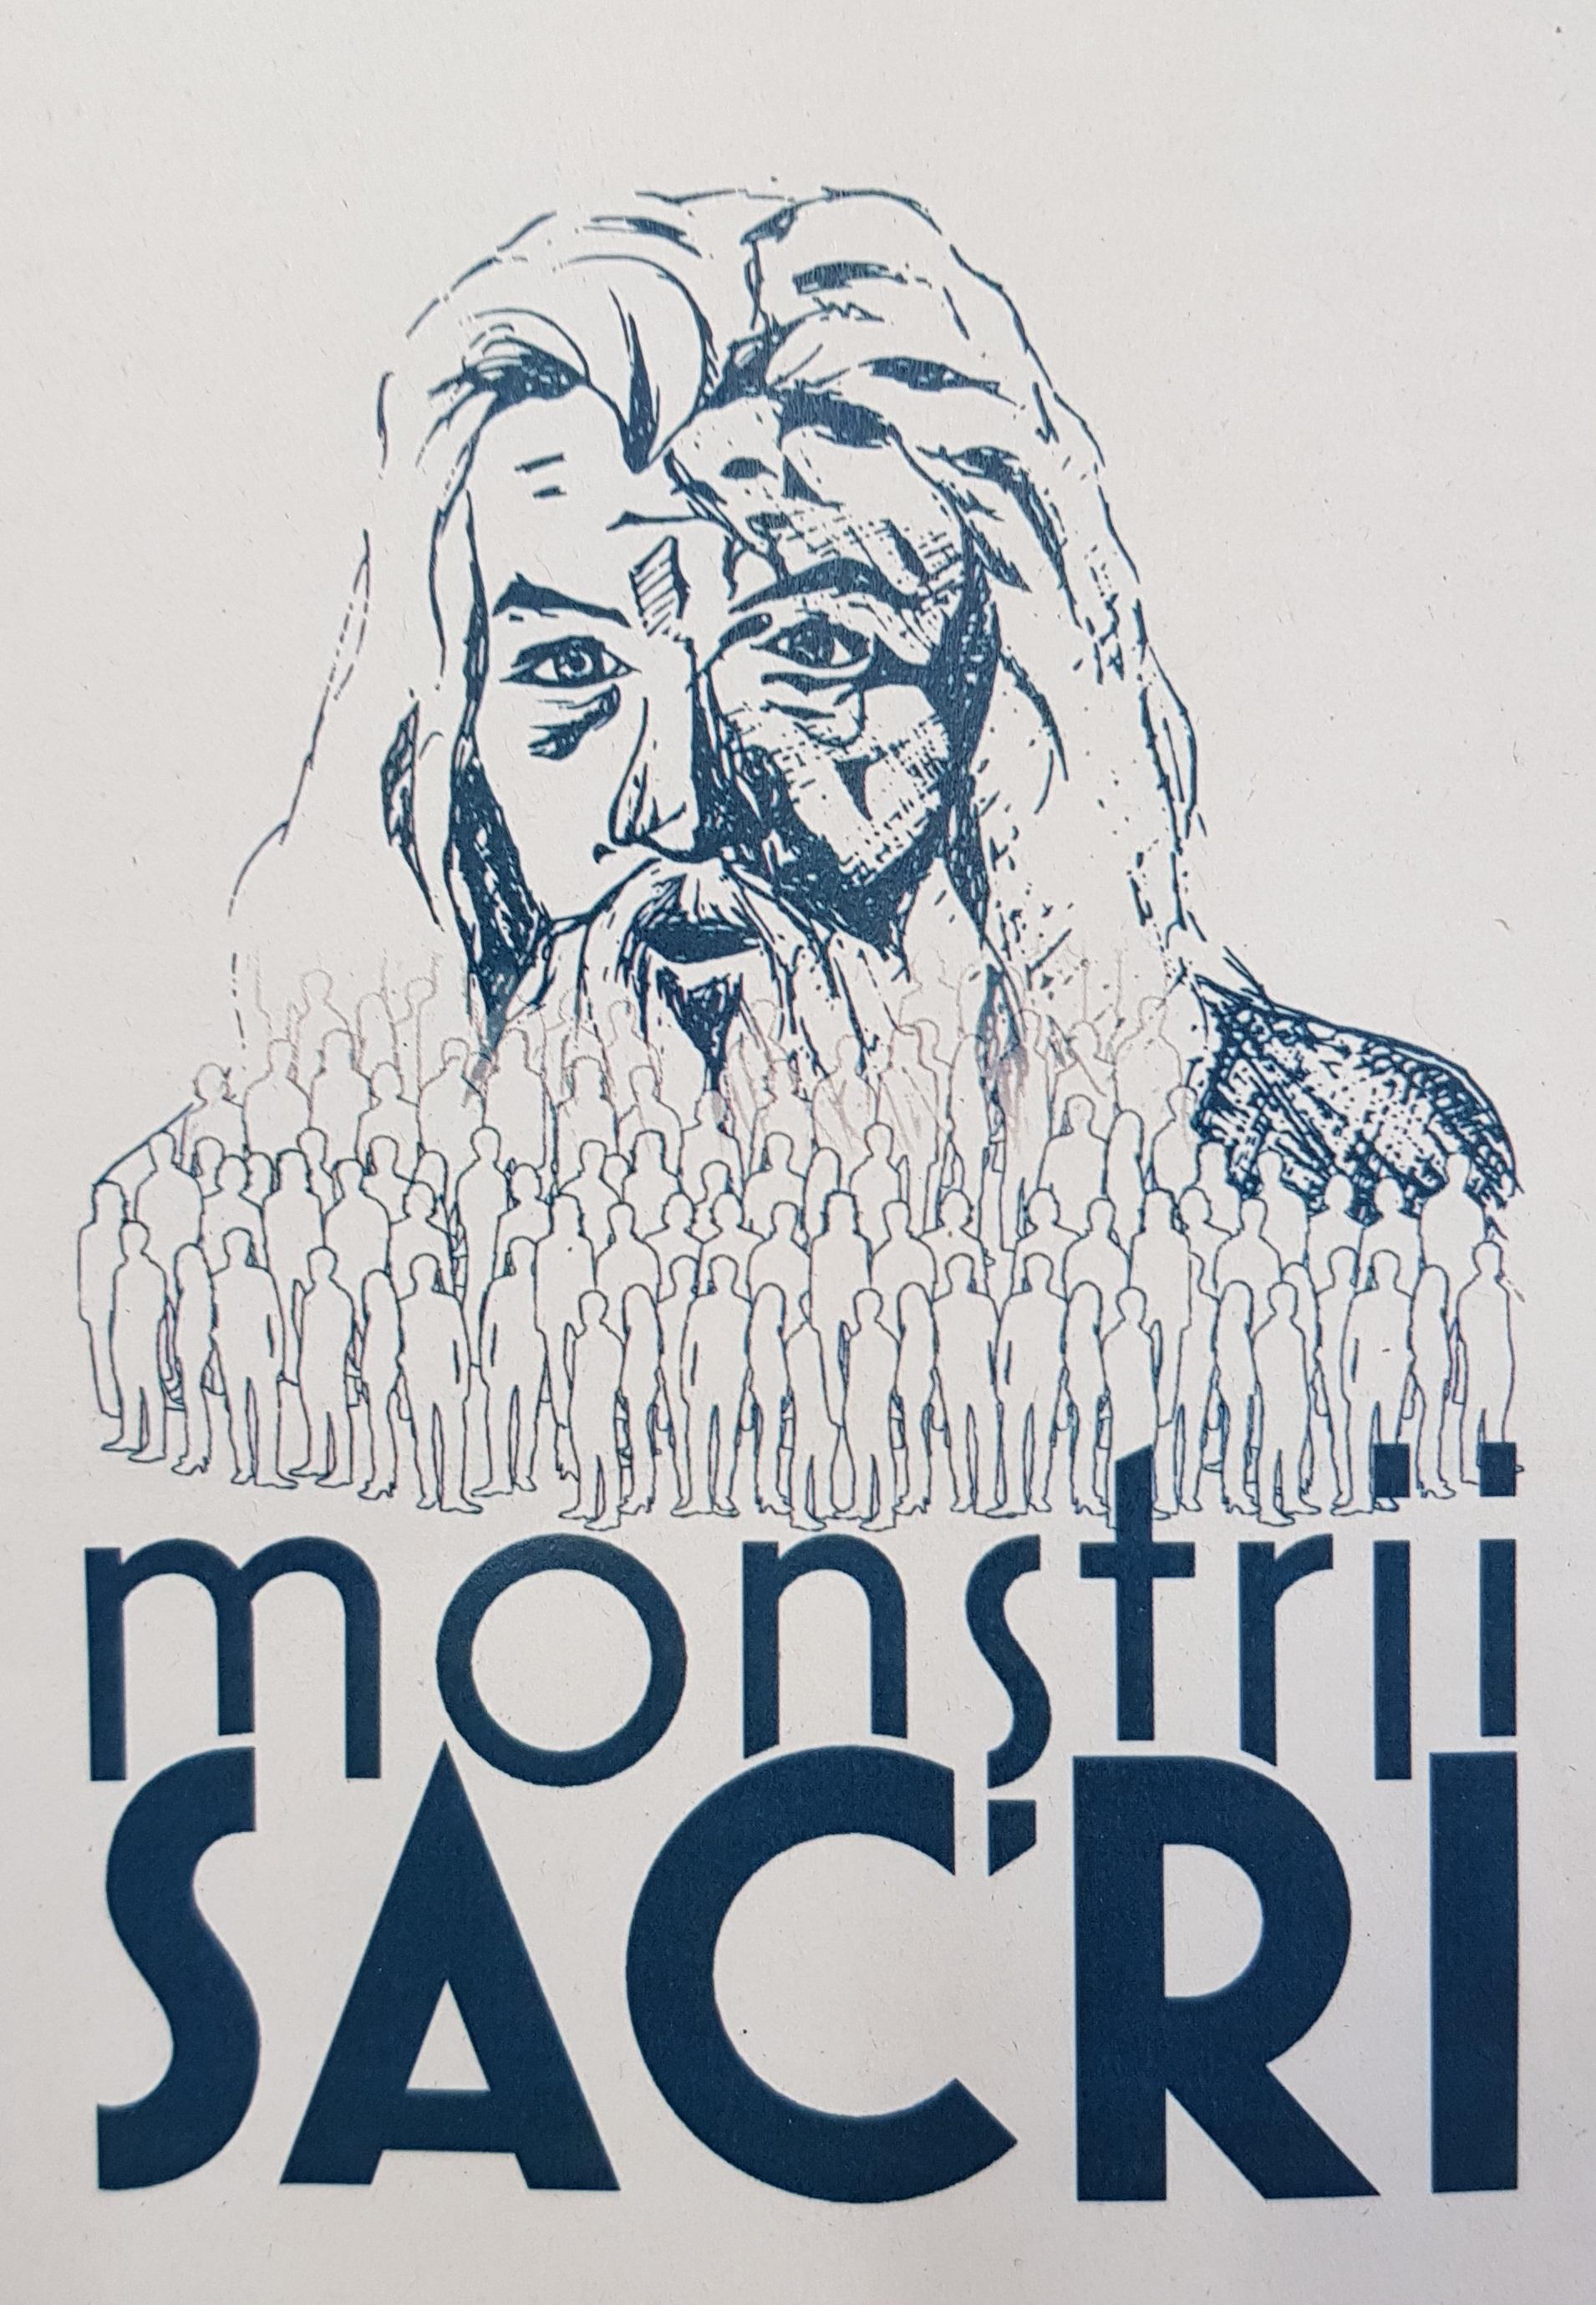 Monstrii Sacri logo